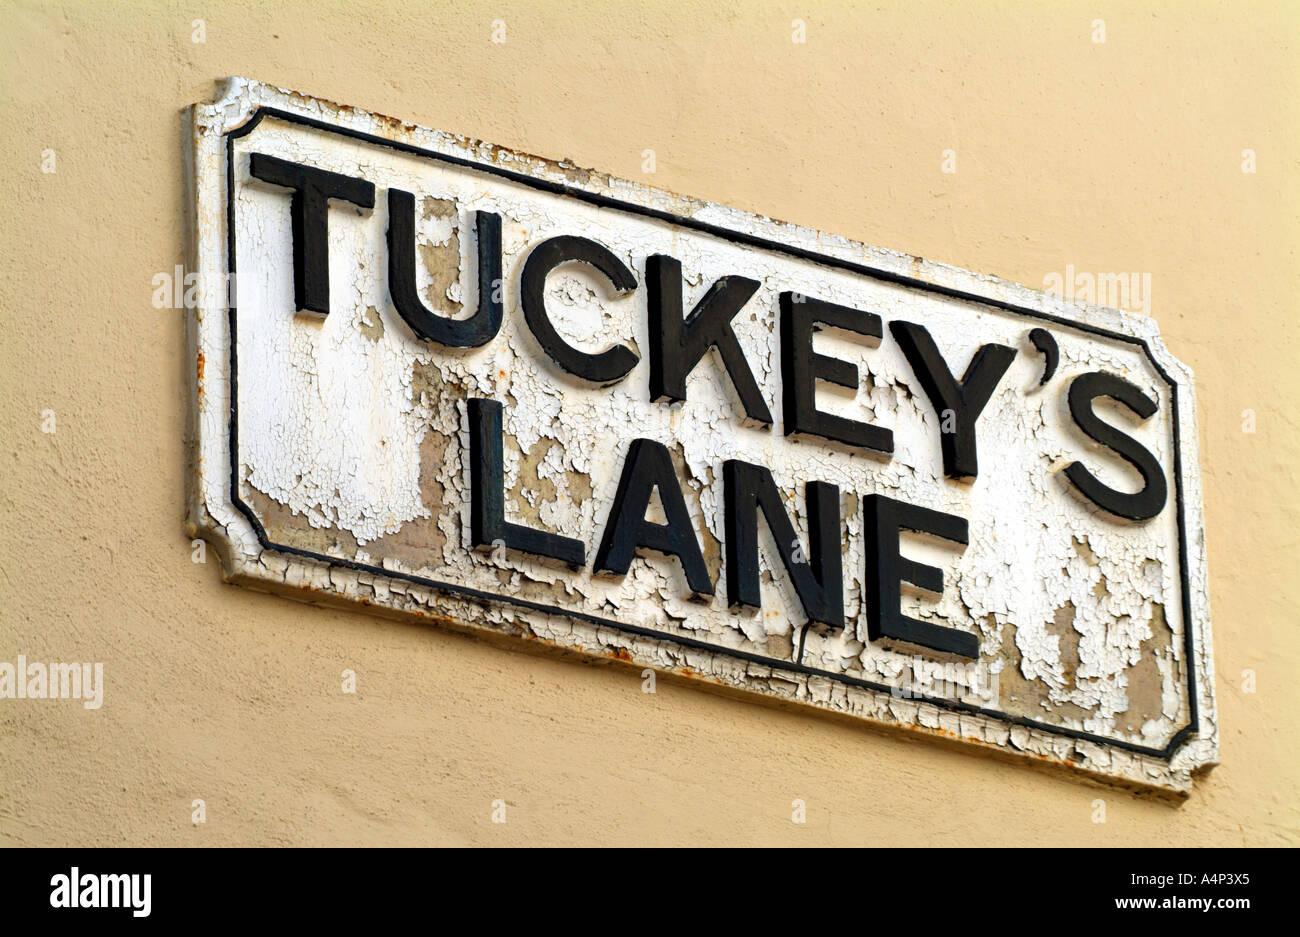 tuckey's lane street sign gibraltar - Stock Image